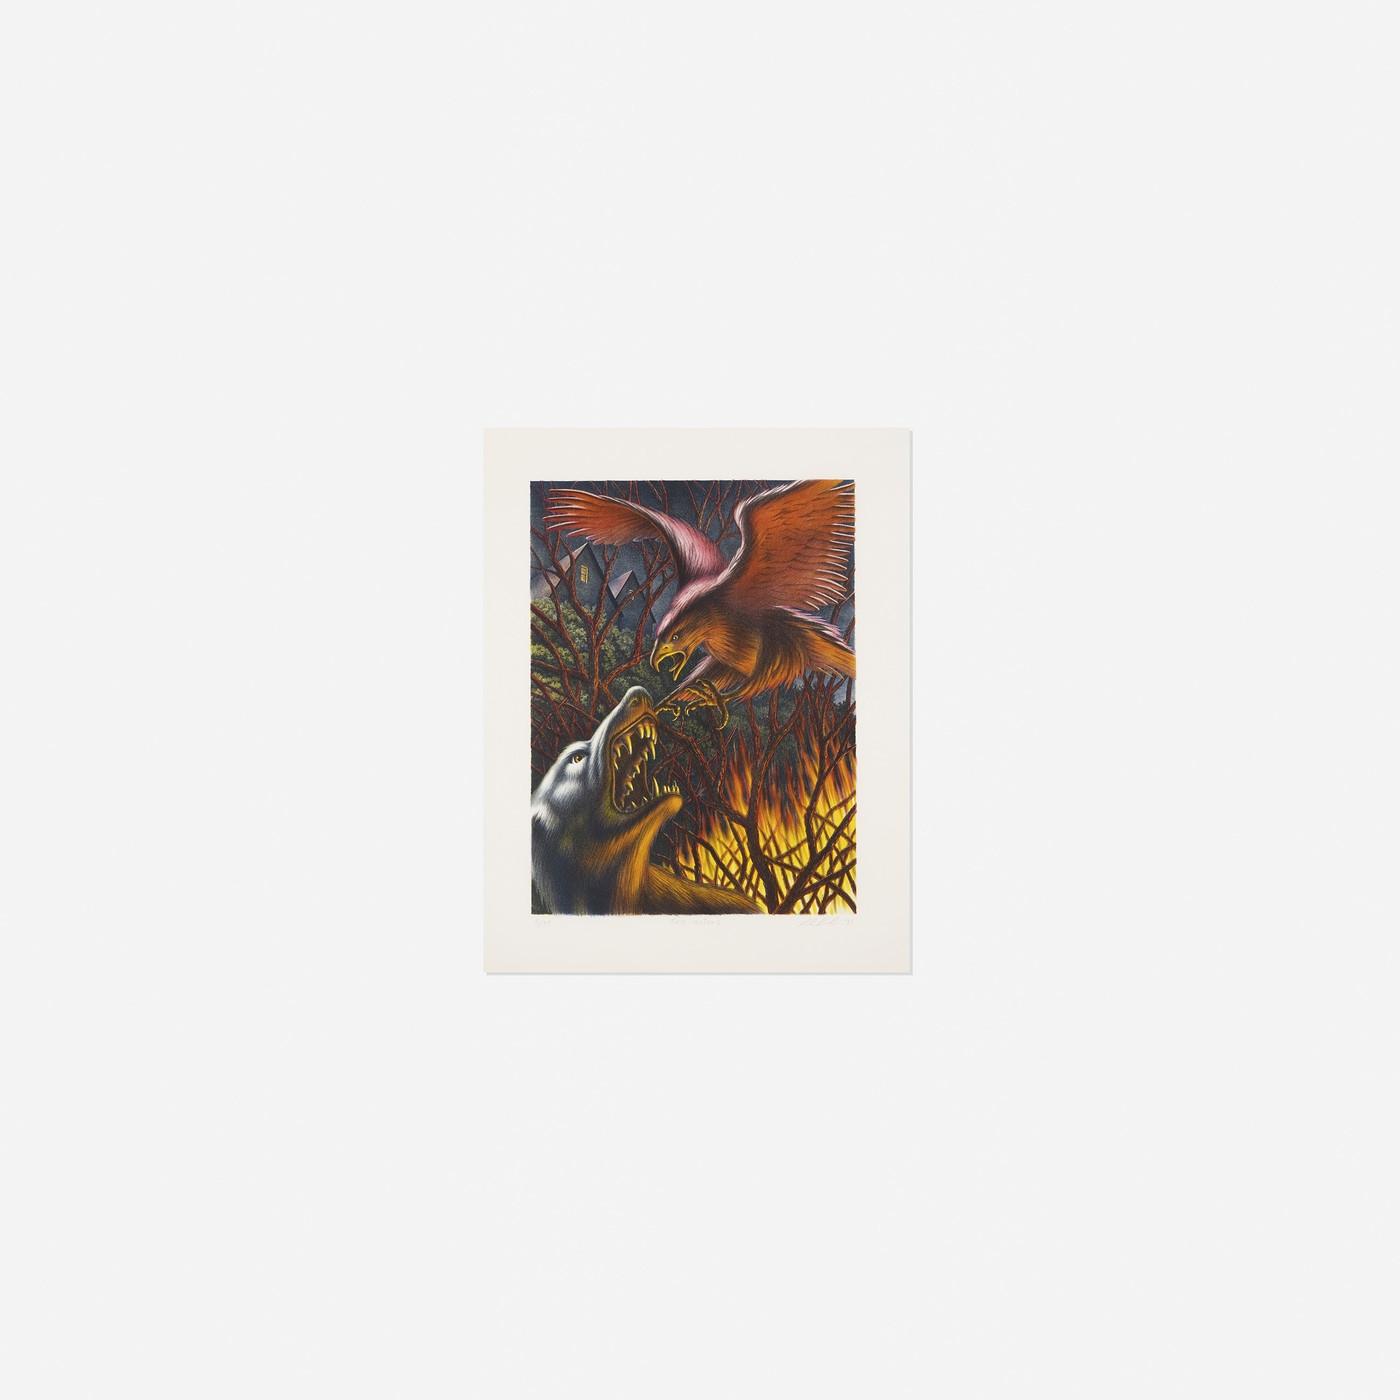 Andrea Londo Nua https://www.mutualart/artwork/f-is-for-fro